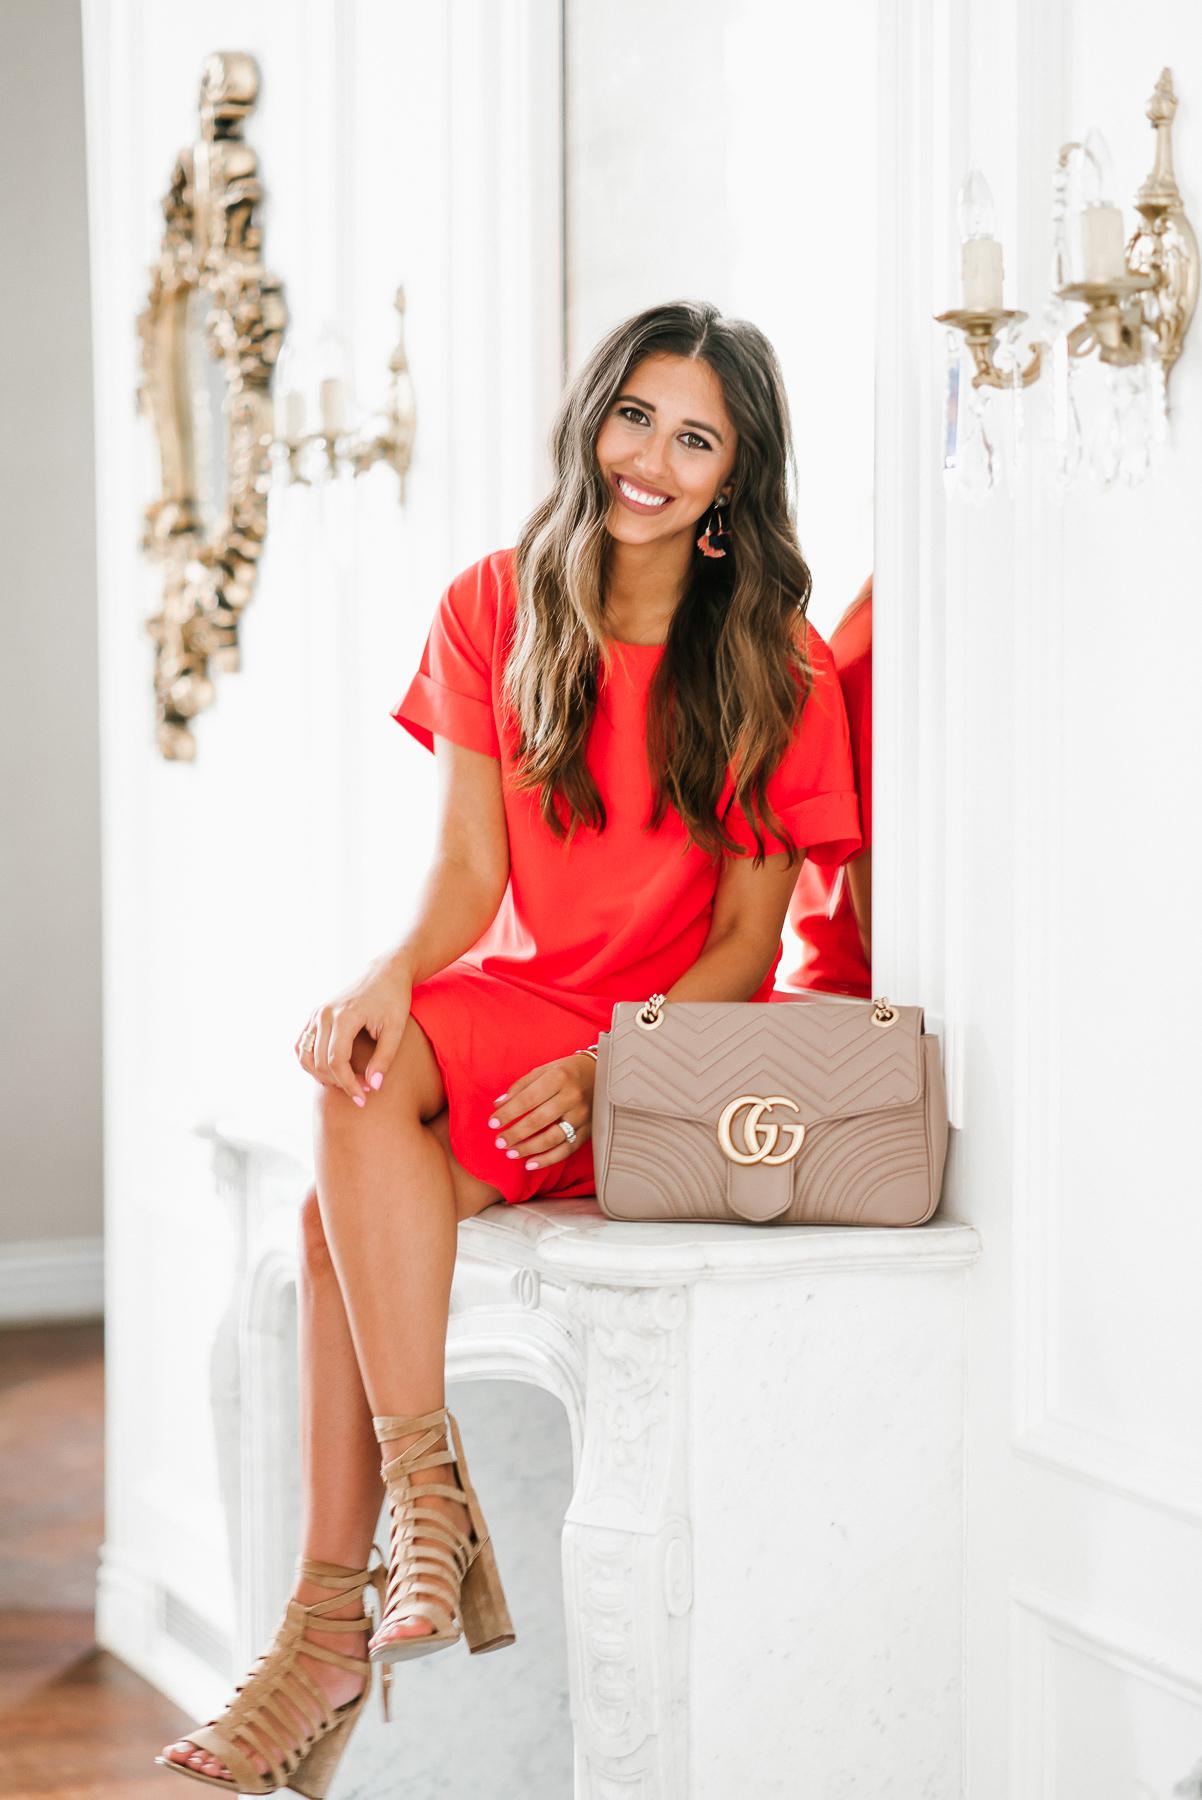 Dress Up Buttercup, Dede Raad, Houston Blogger, Fashion Blogger, Orange Crush